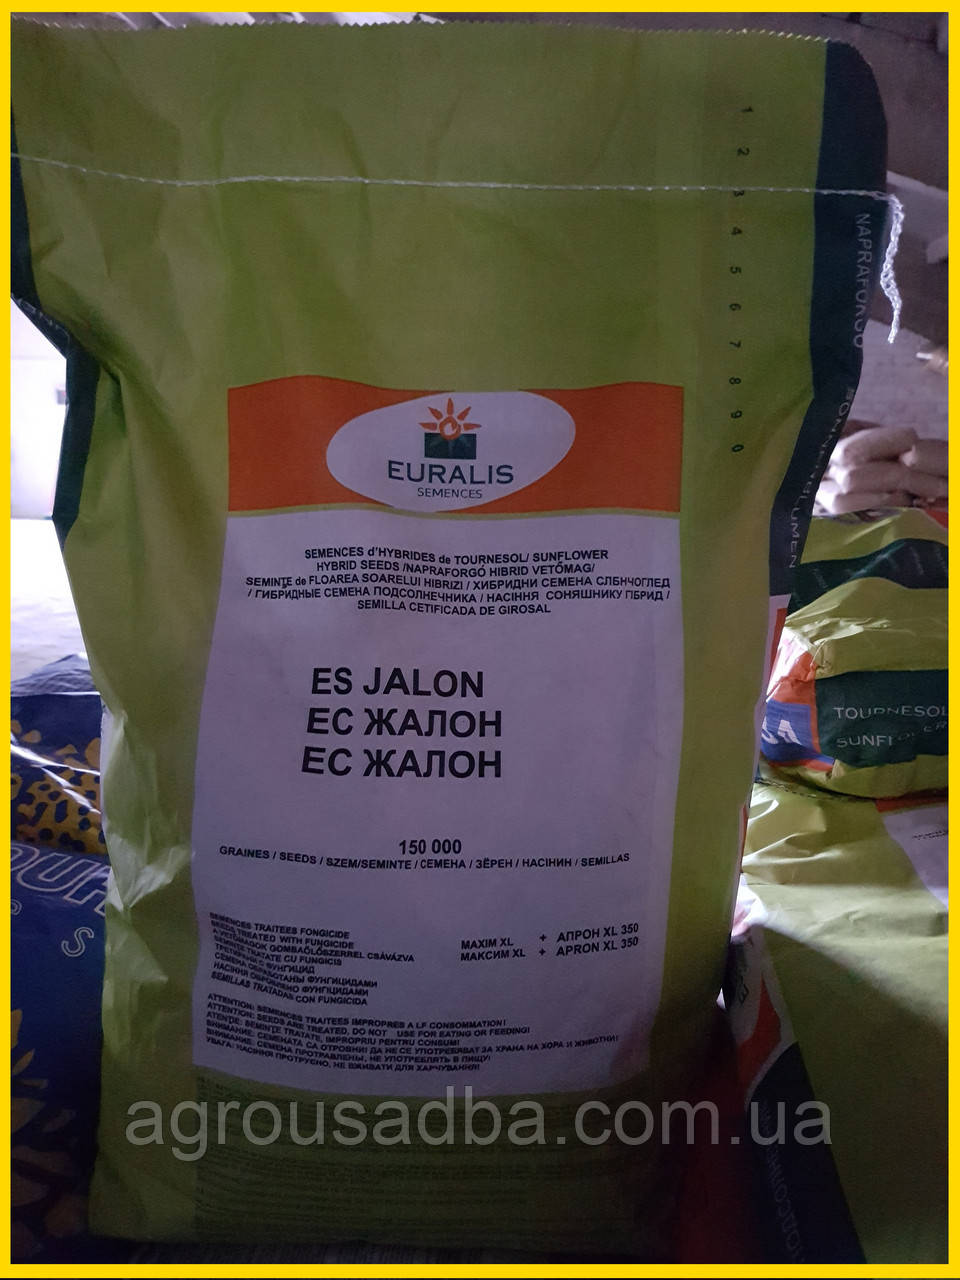 Семена подсолнечника Жалон - Евралис